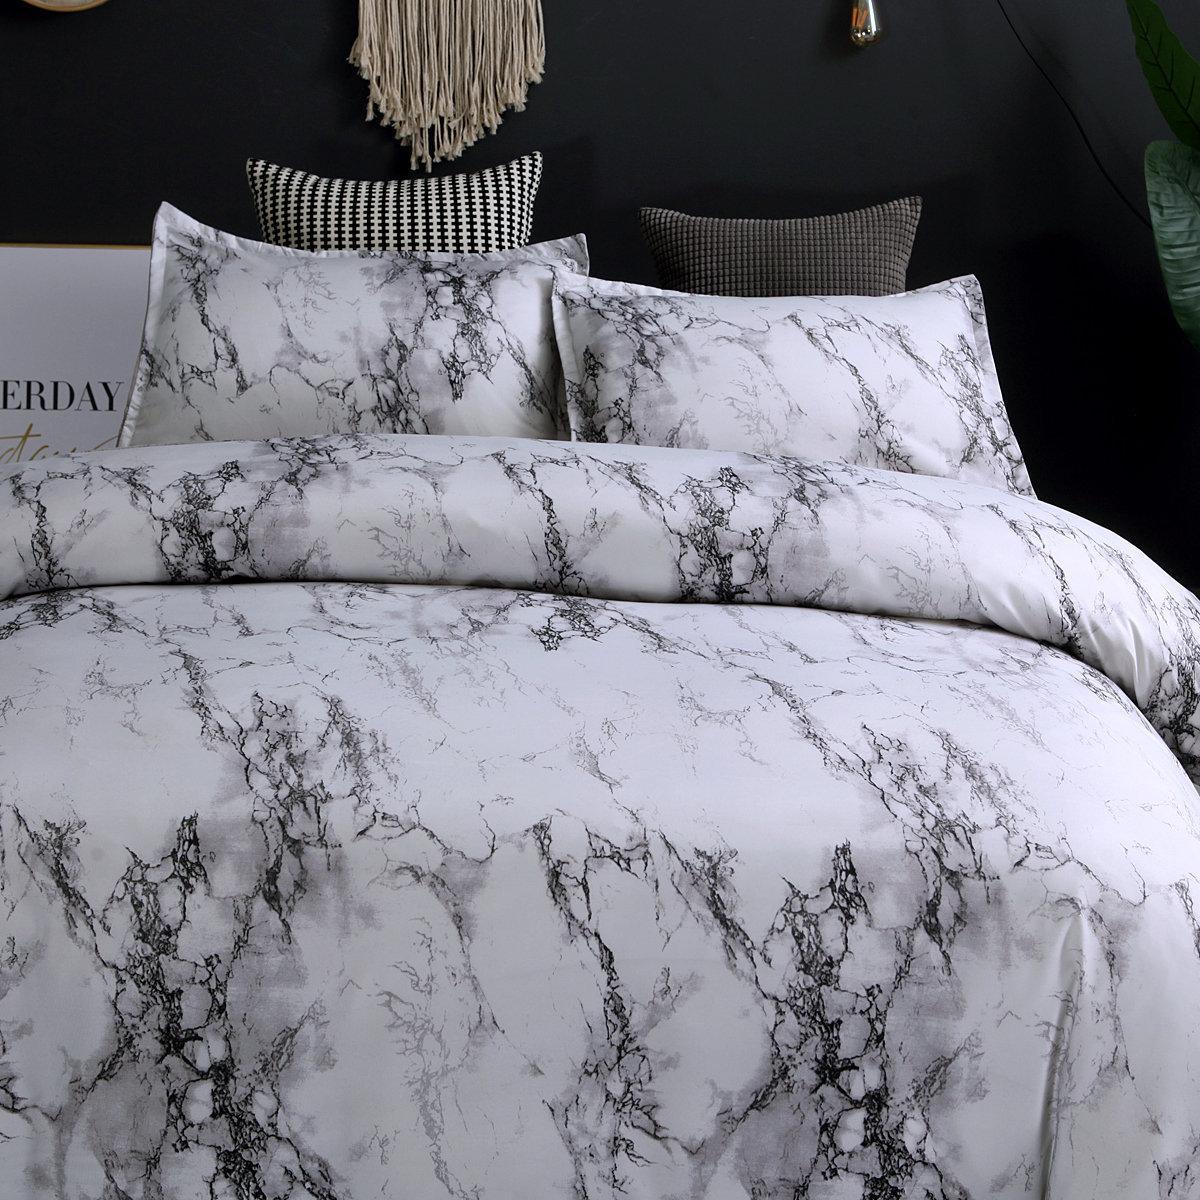 2021 Marble Pattern Bedding Sets Duvet Cover Set 2/3pcs Bed Set Twin Double Queen Quilt Cover Bed linen Duvet Cover (No Sheet No Filling)